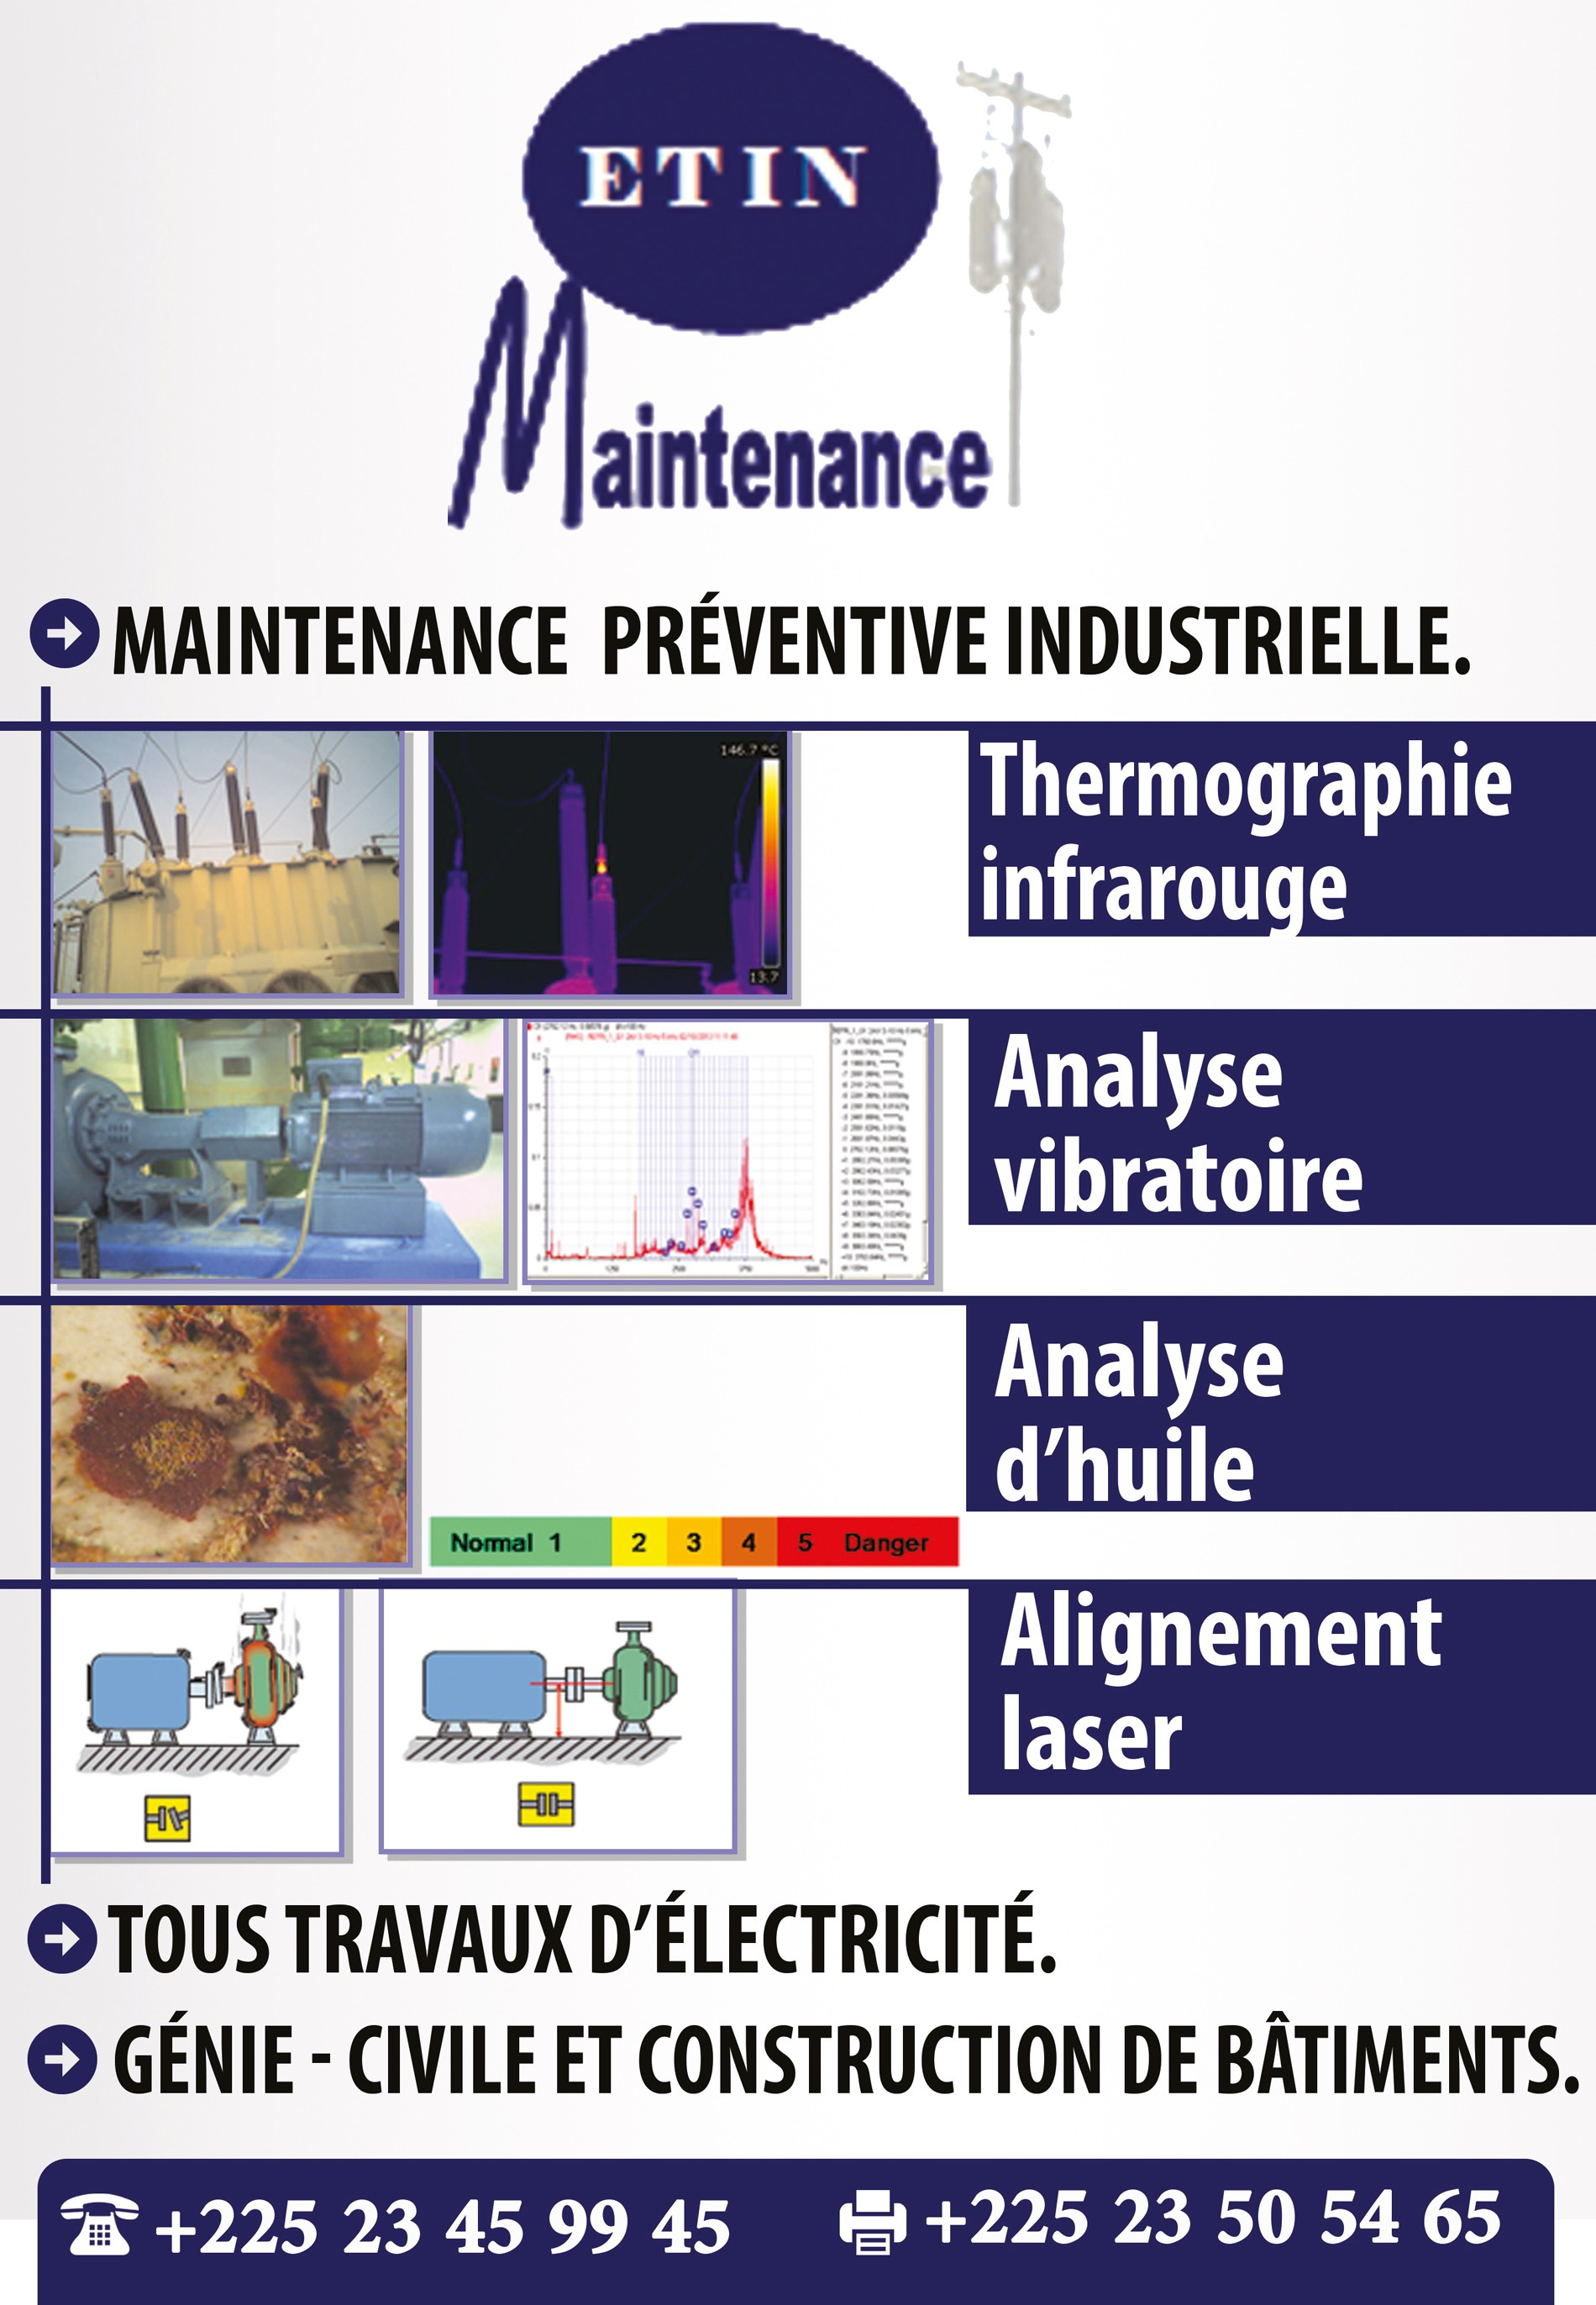 Etin Berechnen Online : etin maintenance d pannage maintenance industrielle ~ Themetempest.com Abrechnung